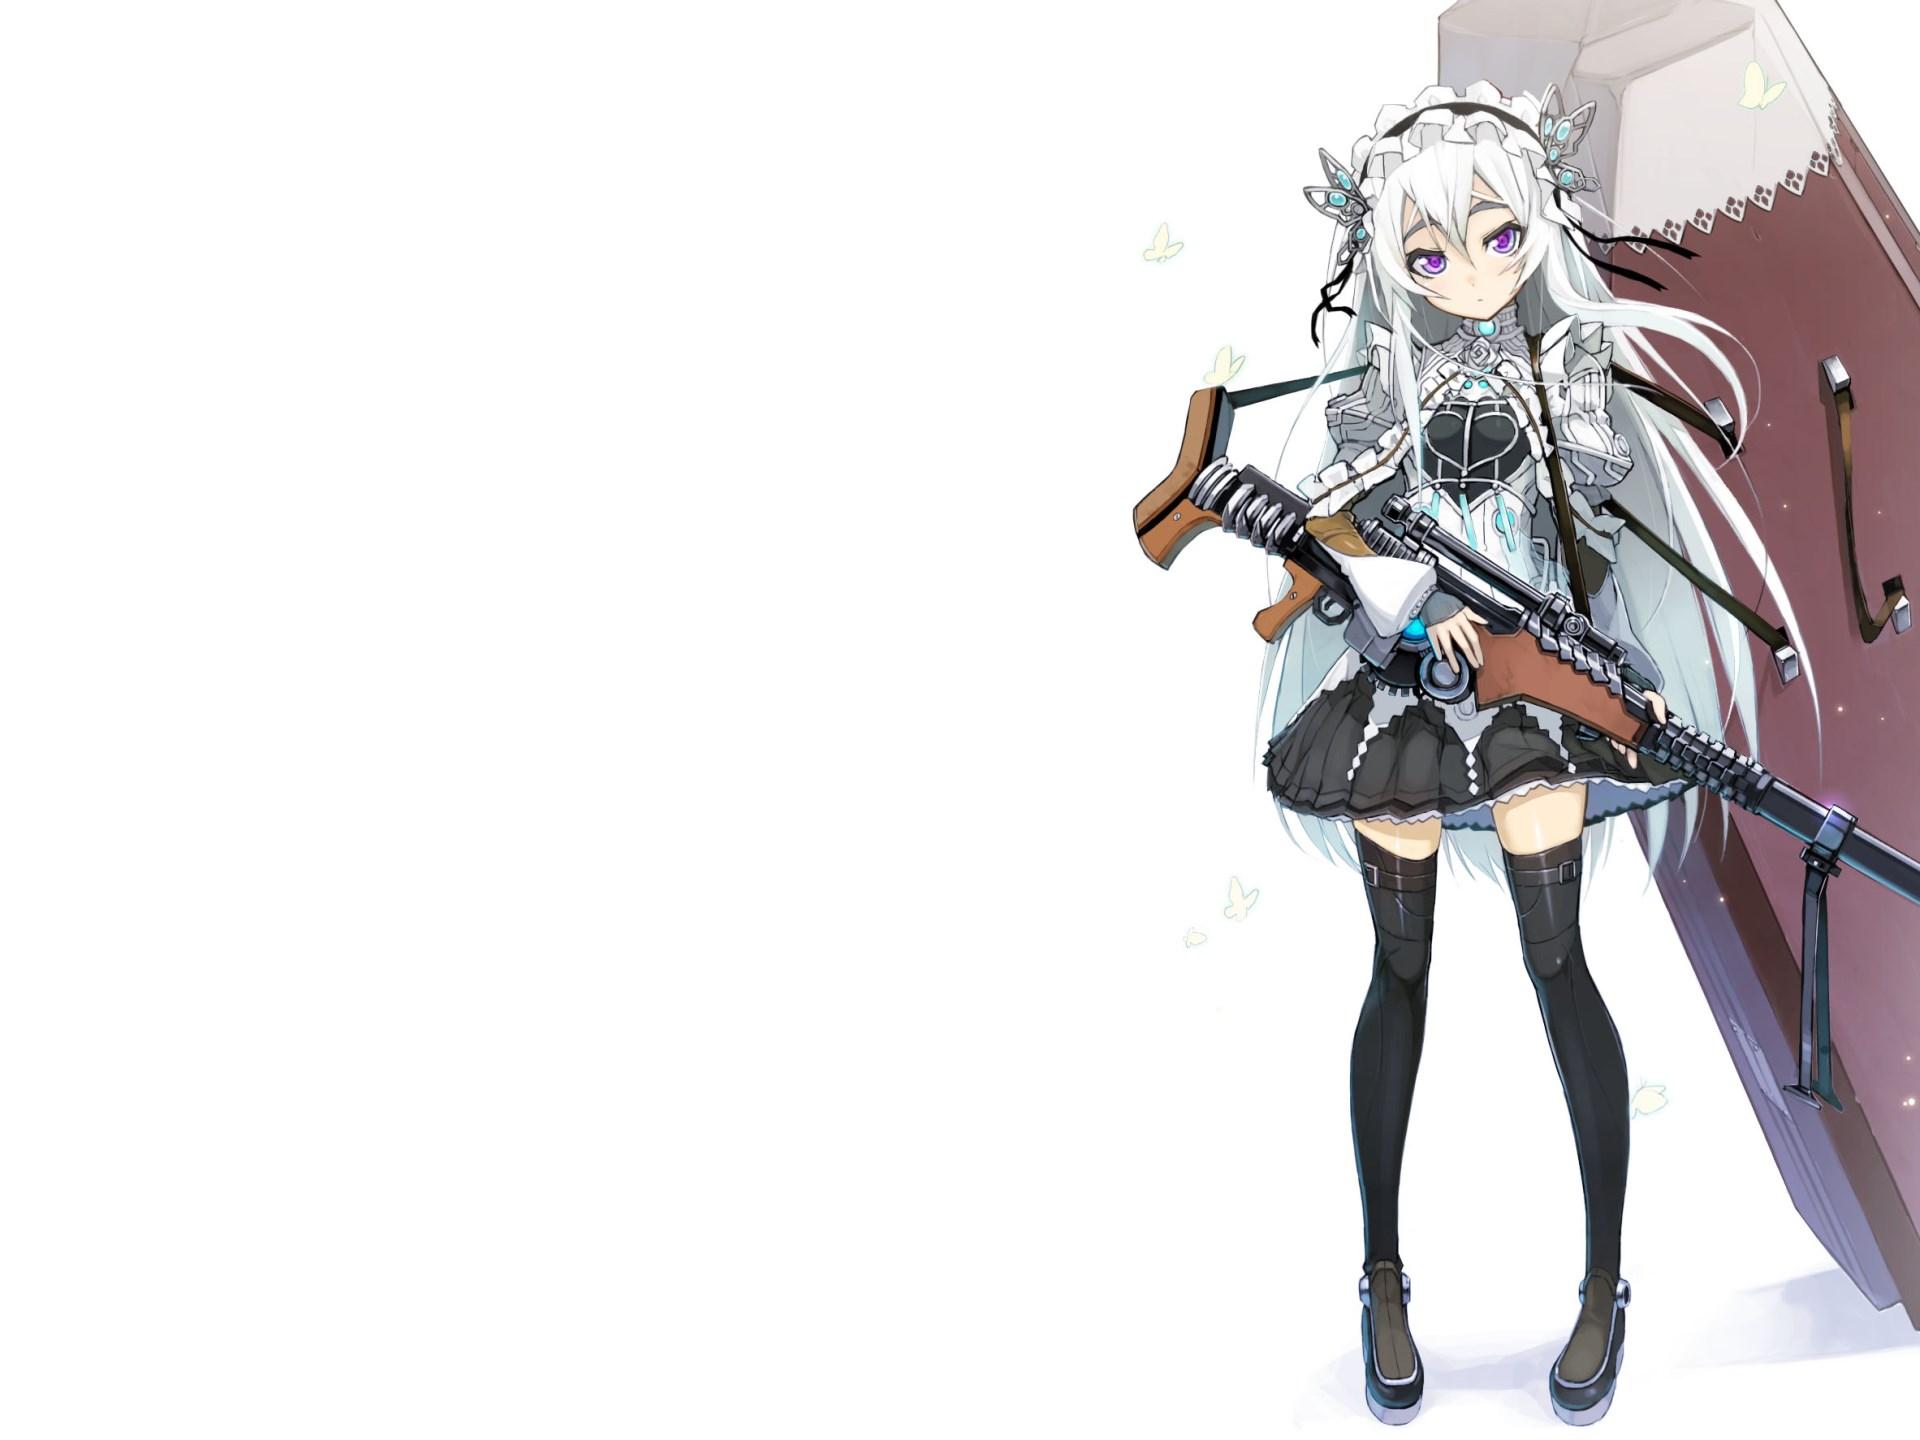 Chaika  The Coffin Princess  HD Wallpaper Background Image 1920x1440